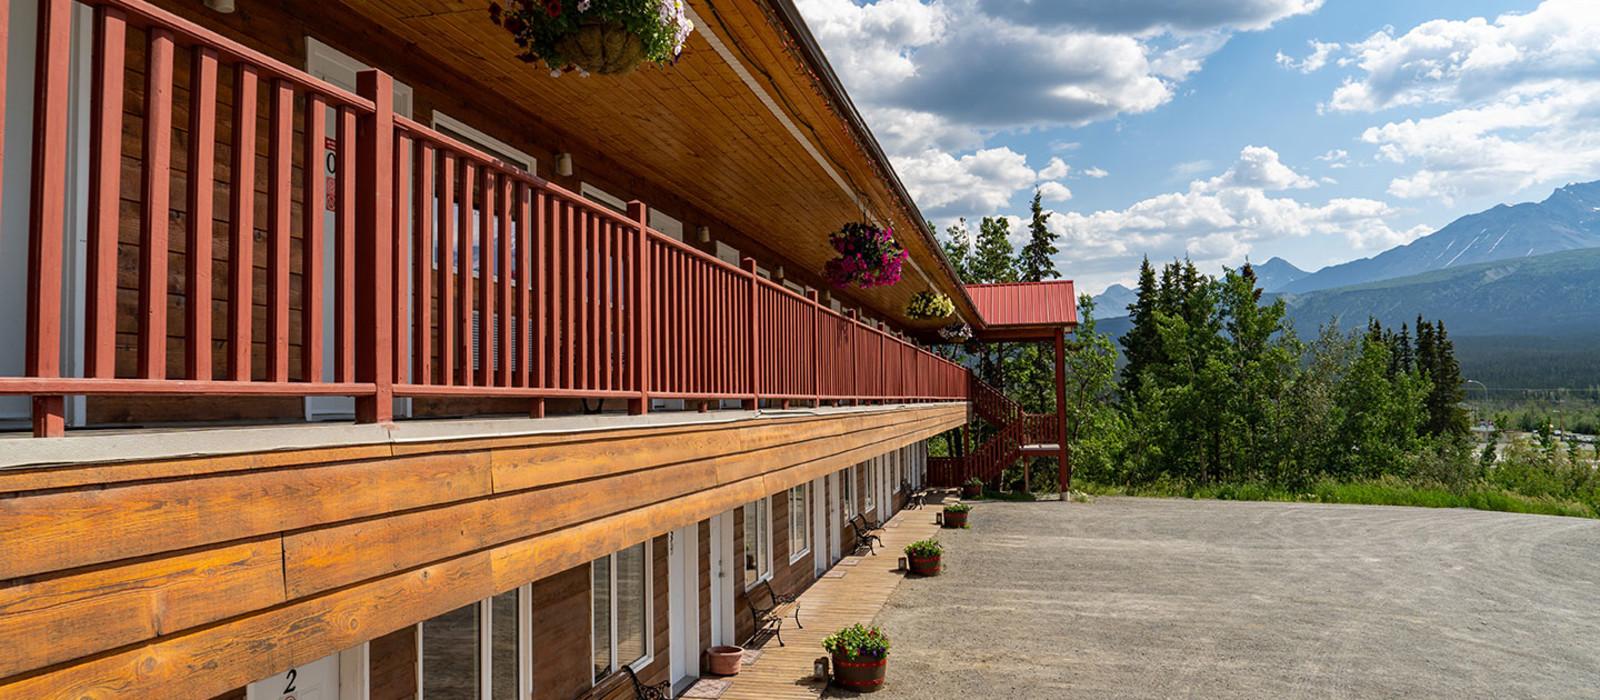 Hotel Alcan Motor Inn Canada